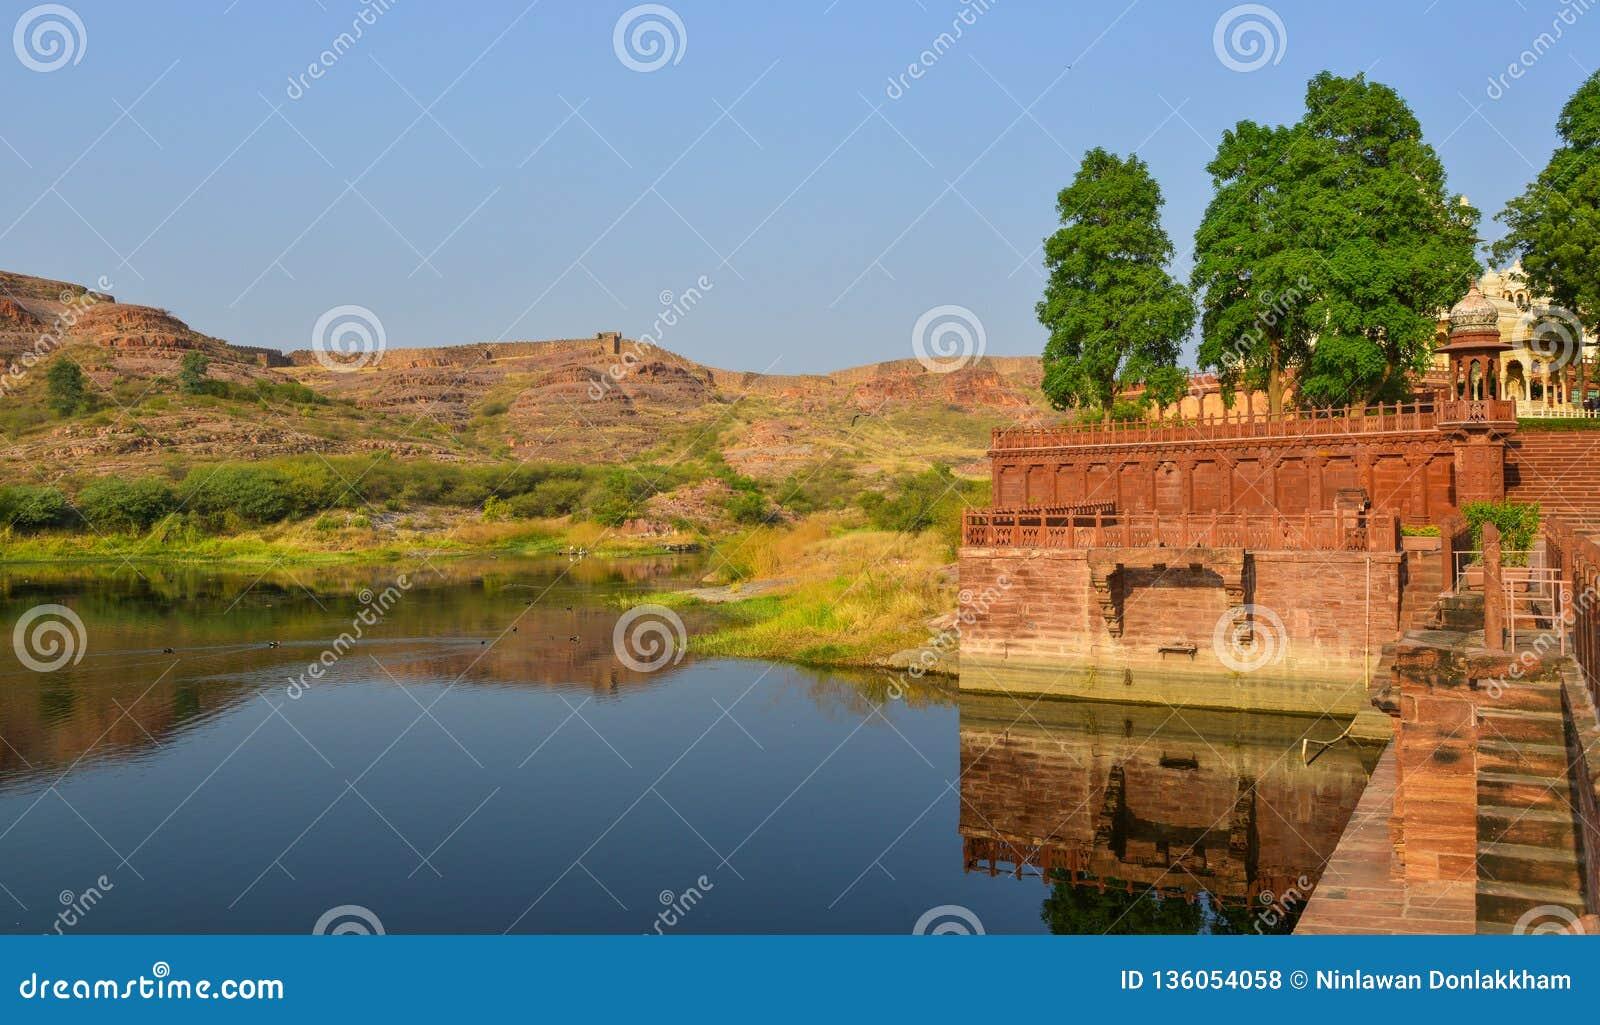 Balsamandmeer in Jodhpur, India